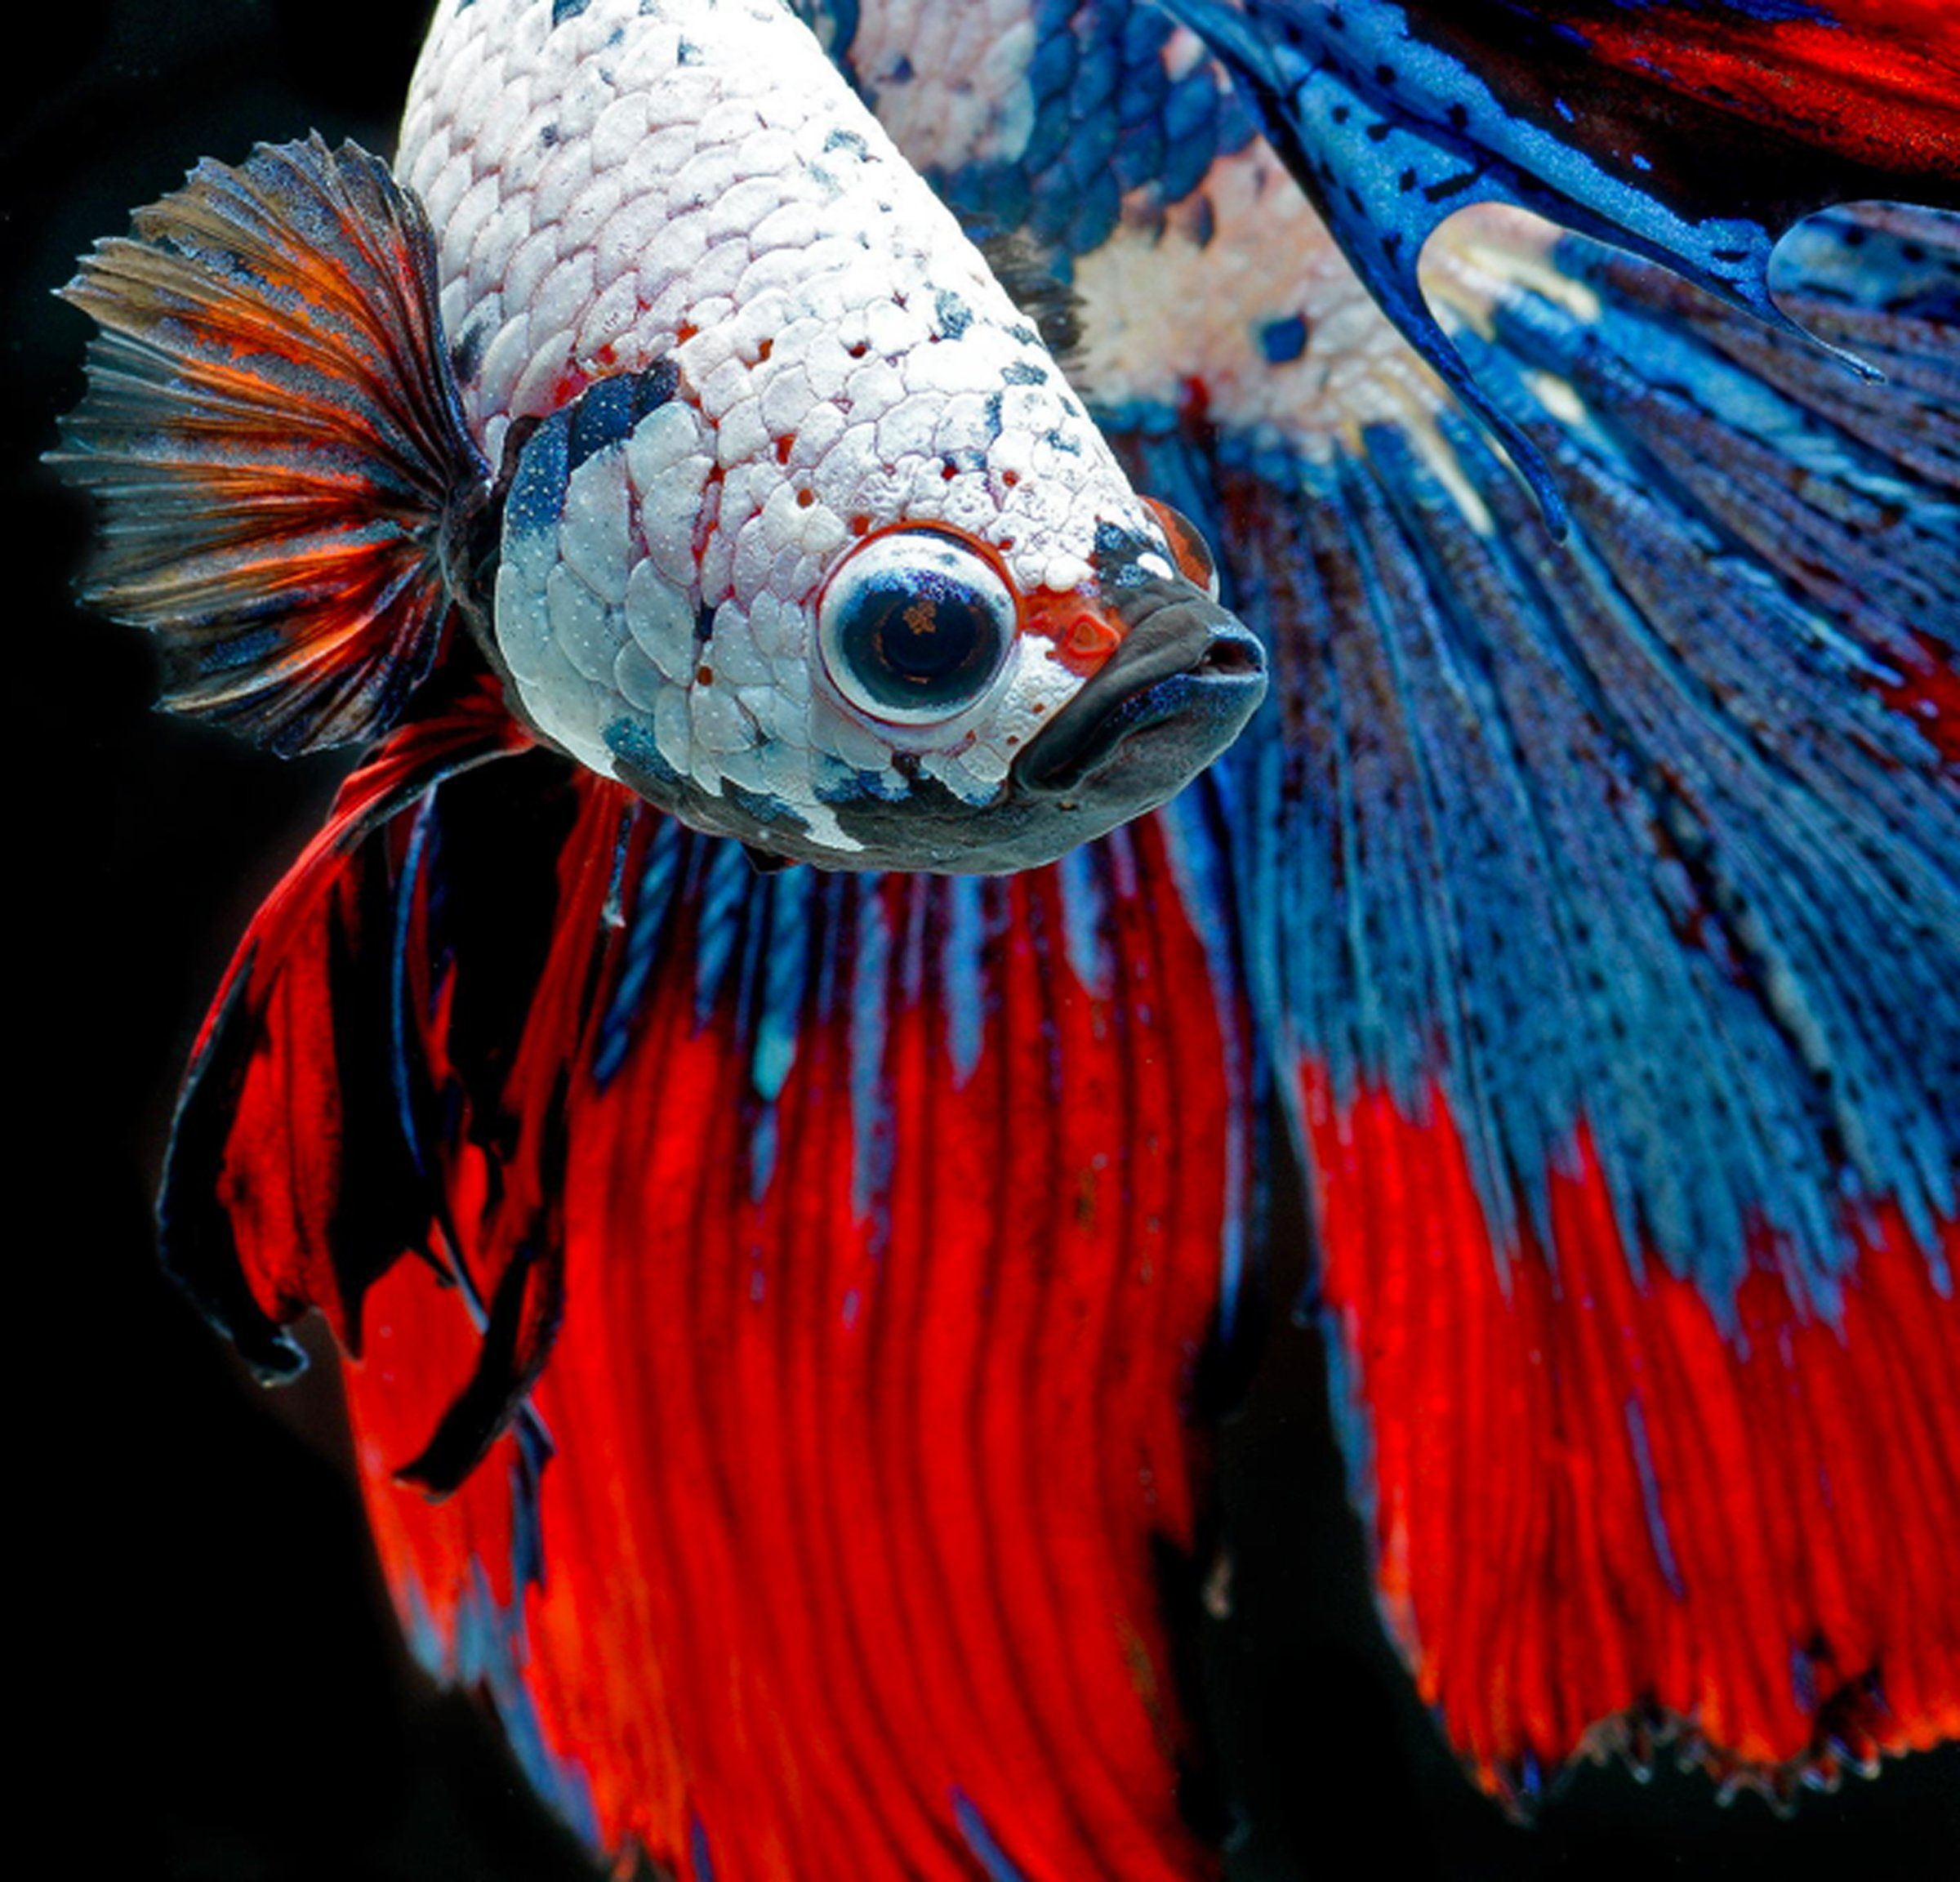 Betta Fish HD Wallpaper | Free Wallpapers | Pinterest | Betta, Betta ...